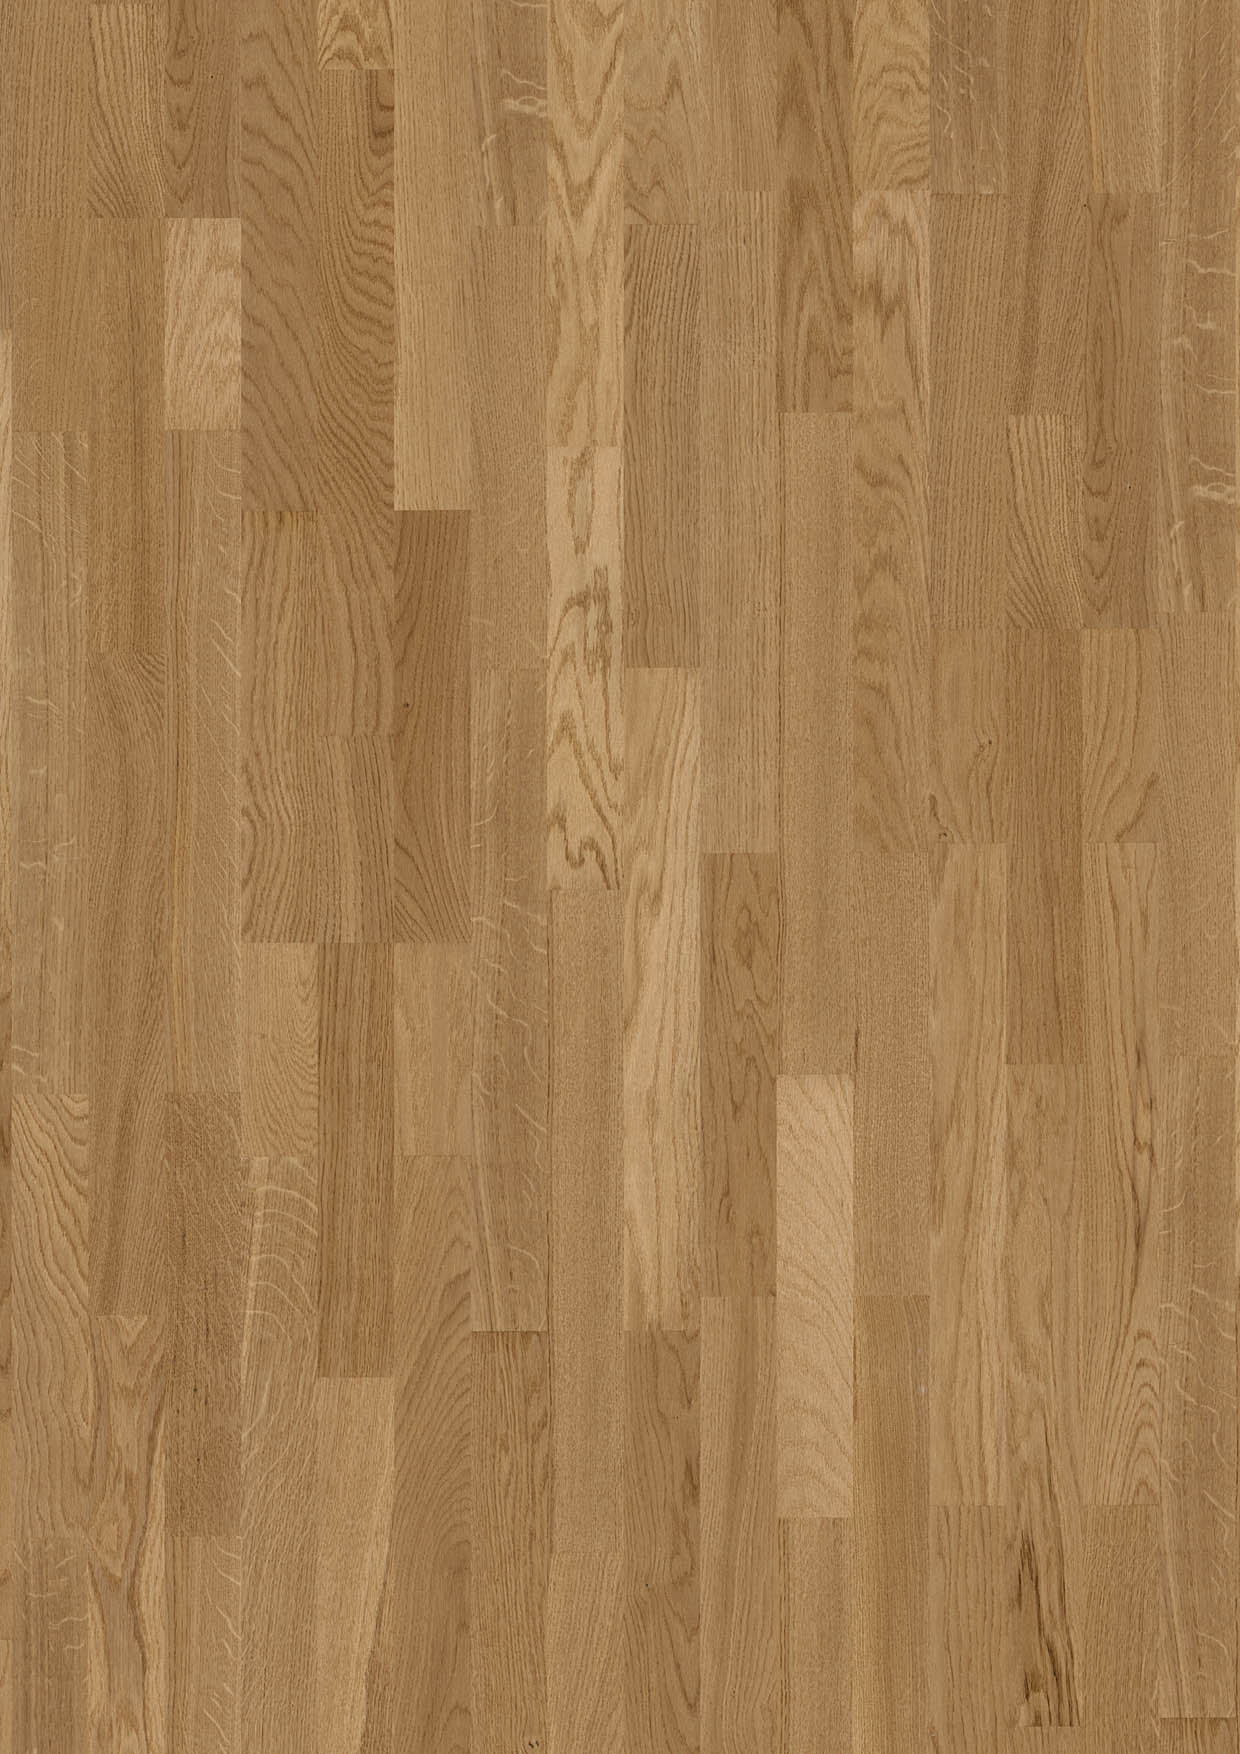 american oak hardwood flooring of oak american us only 3 strip flooring live satin lacquer 13 x pertaining to enhltptd